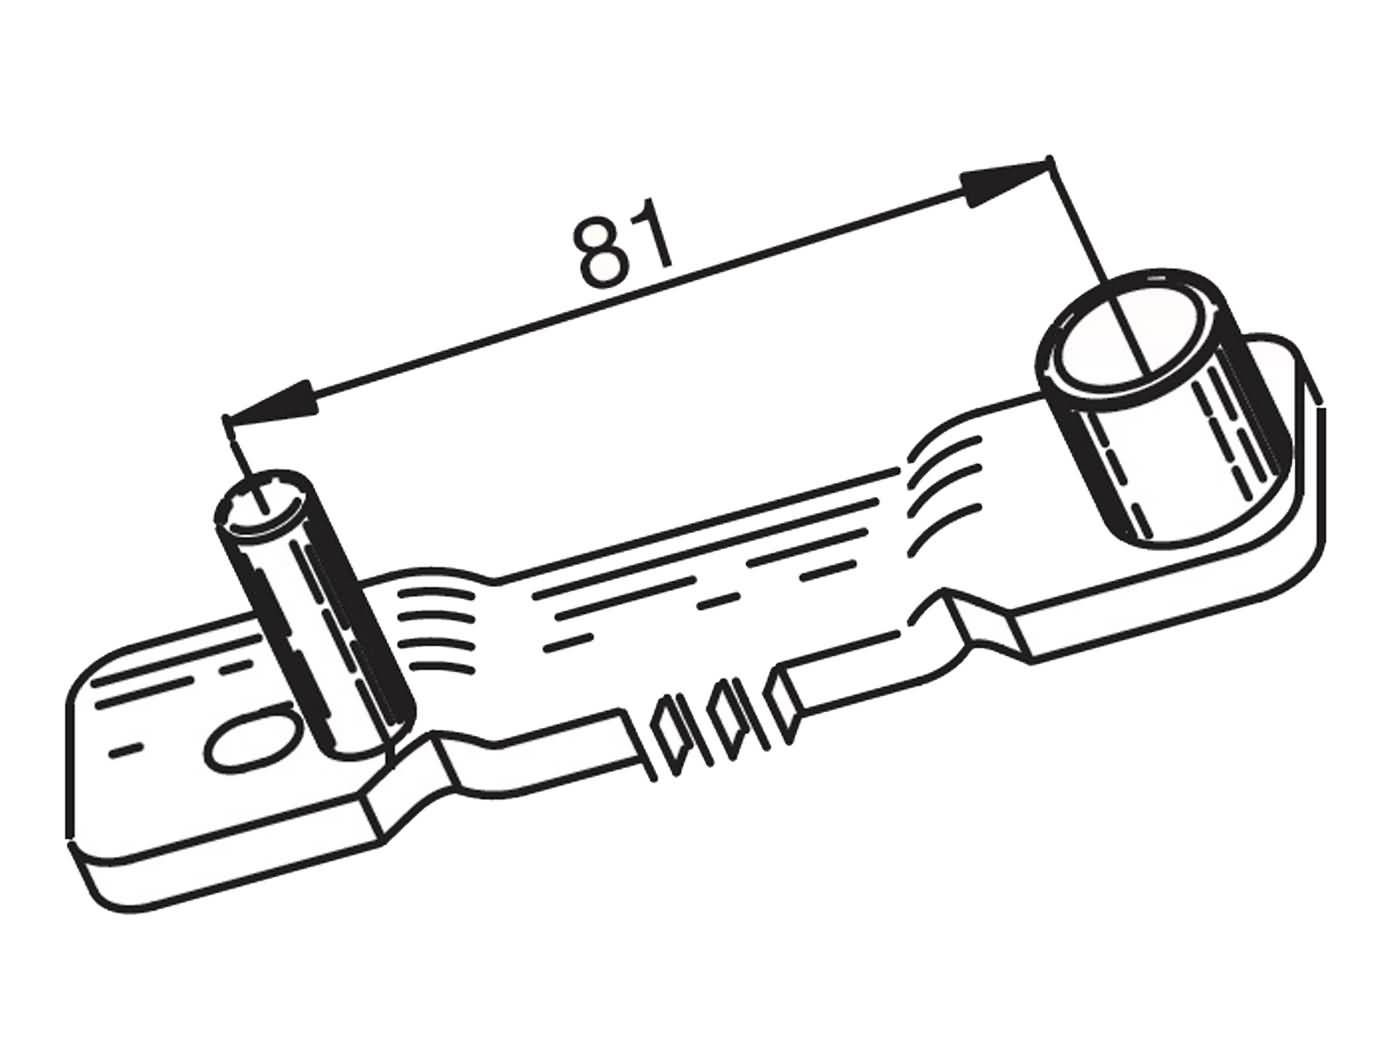 Variomatik Blockierwerkzeug Peugeot 50-100cc 2-Takt